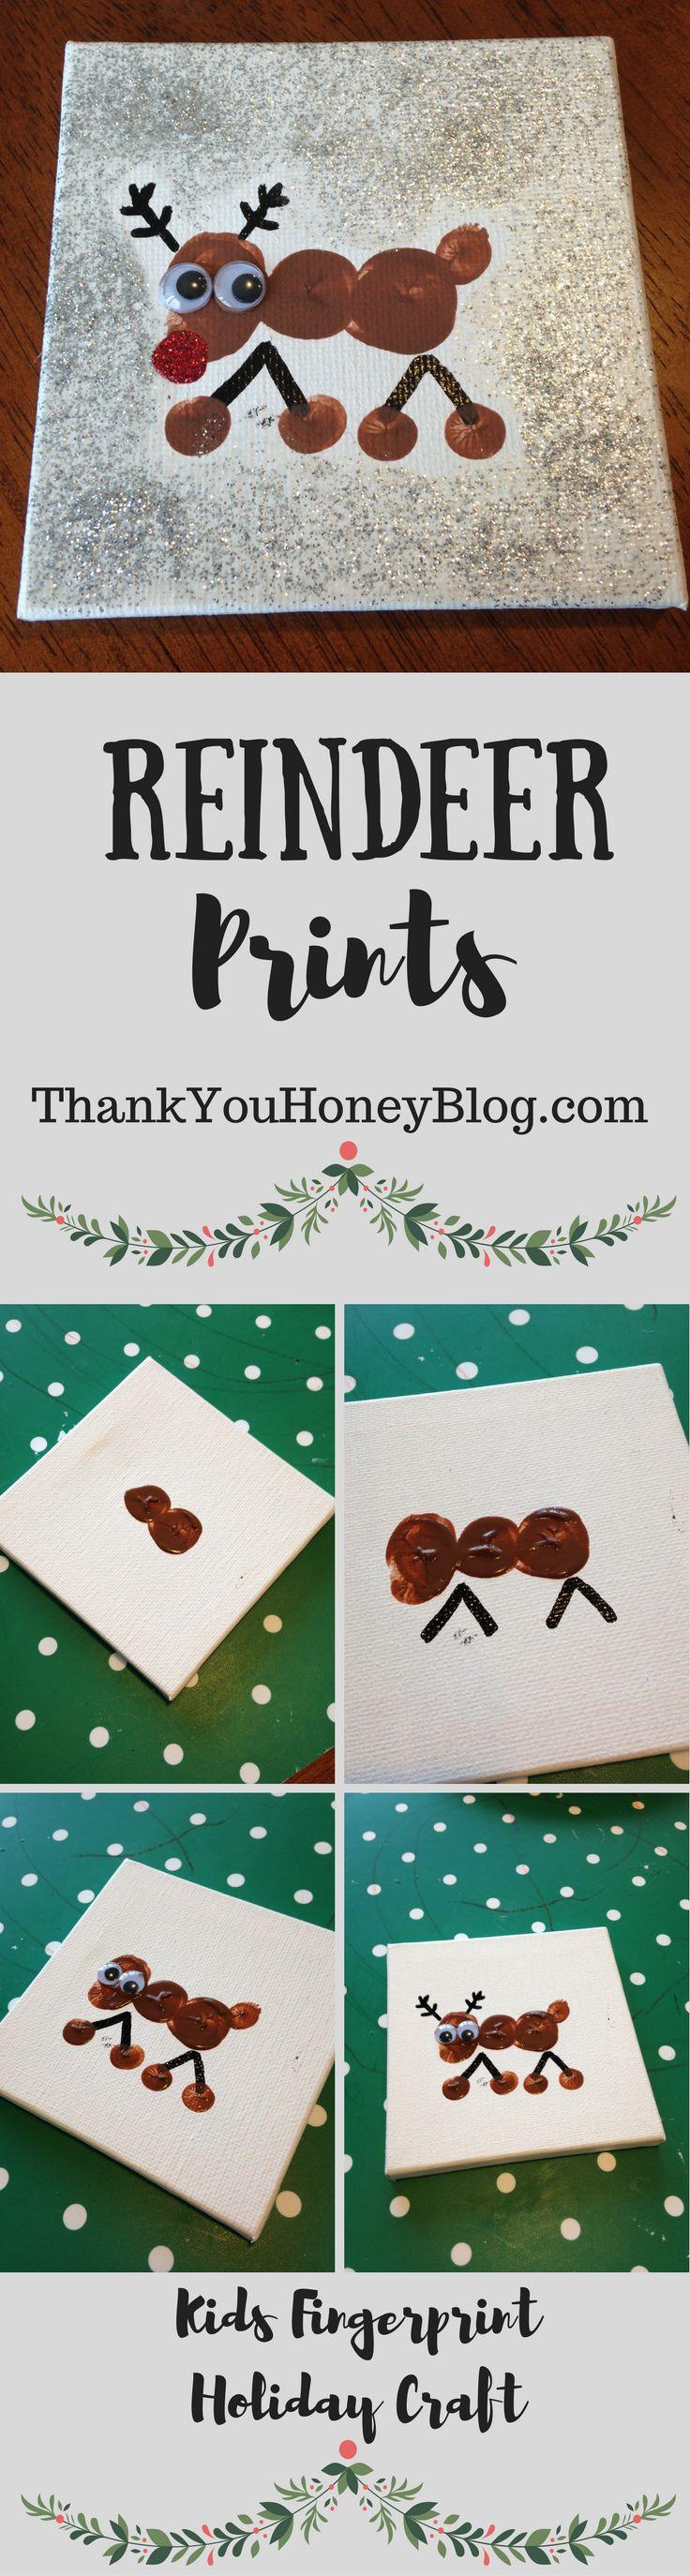 Reindeer Prints Kids Holiday Craft